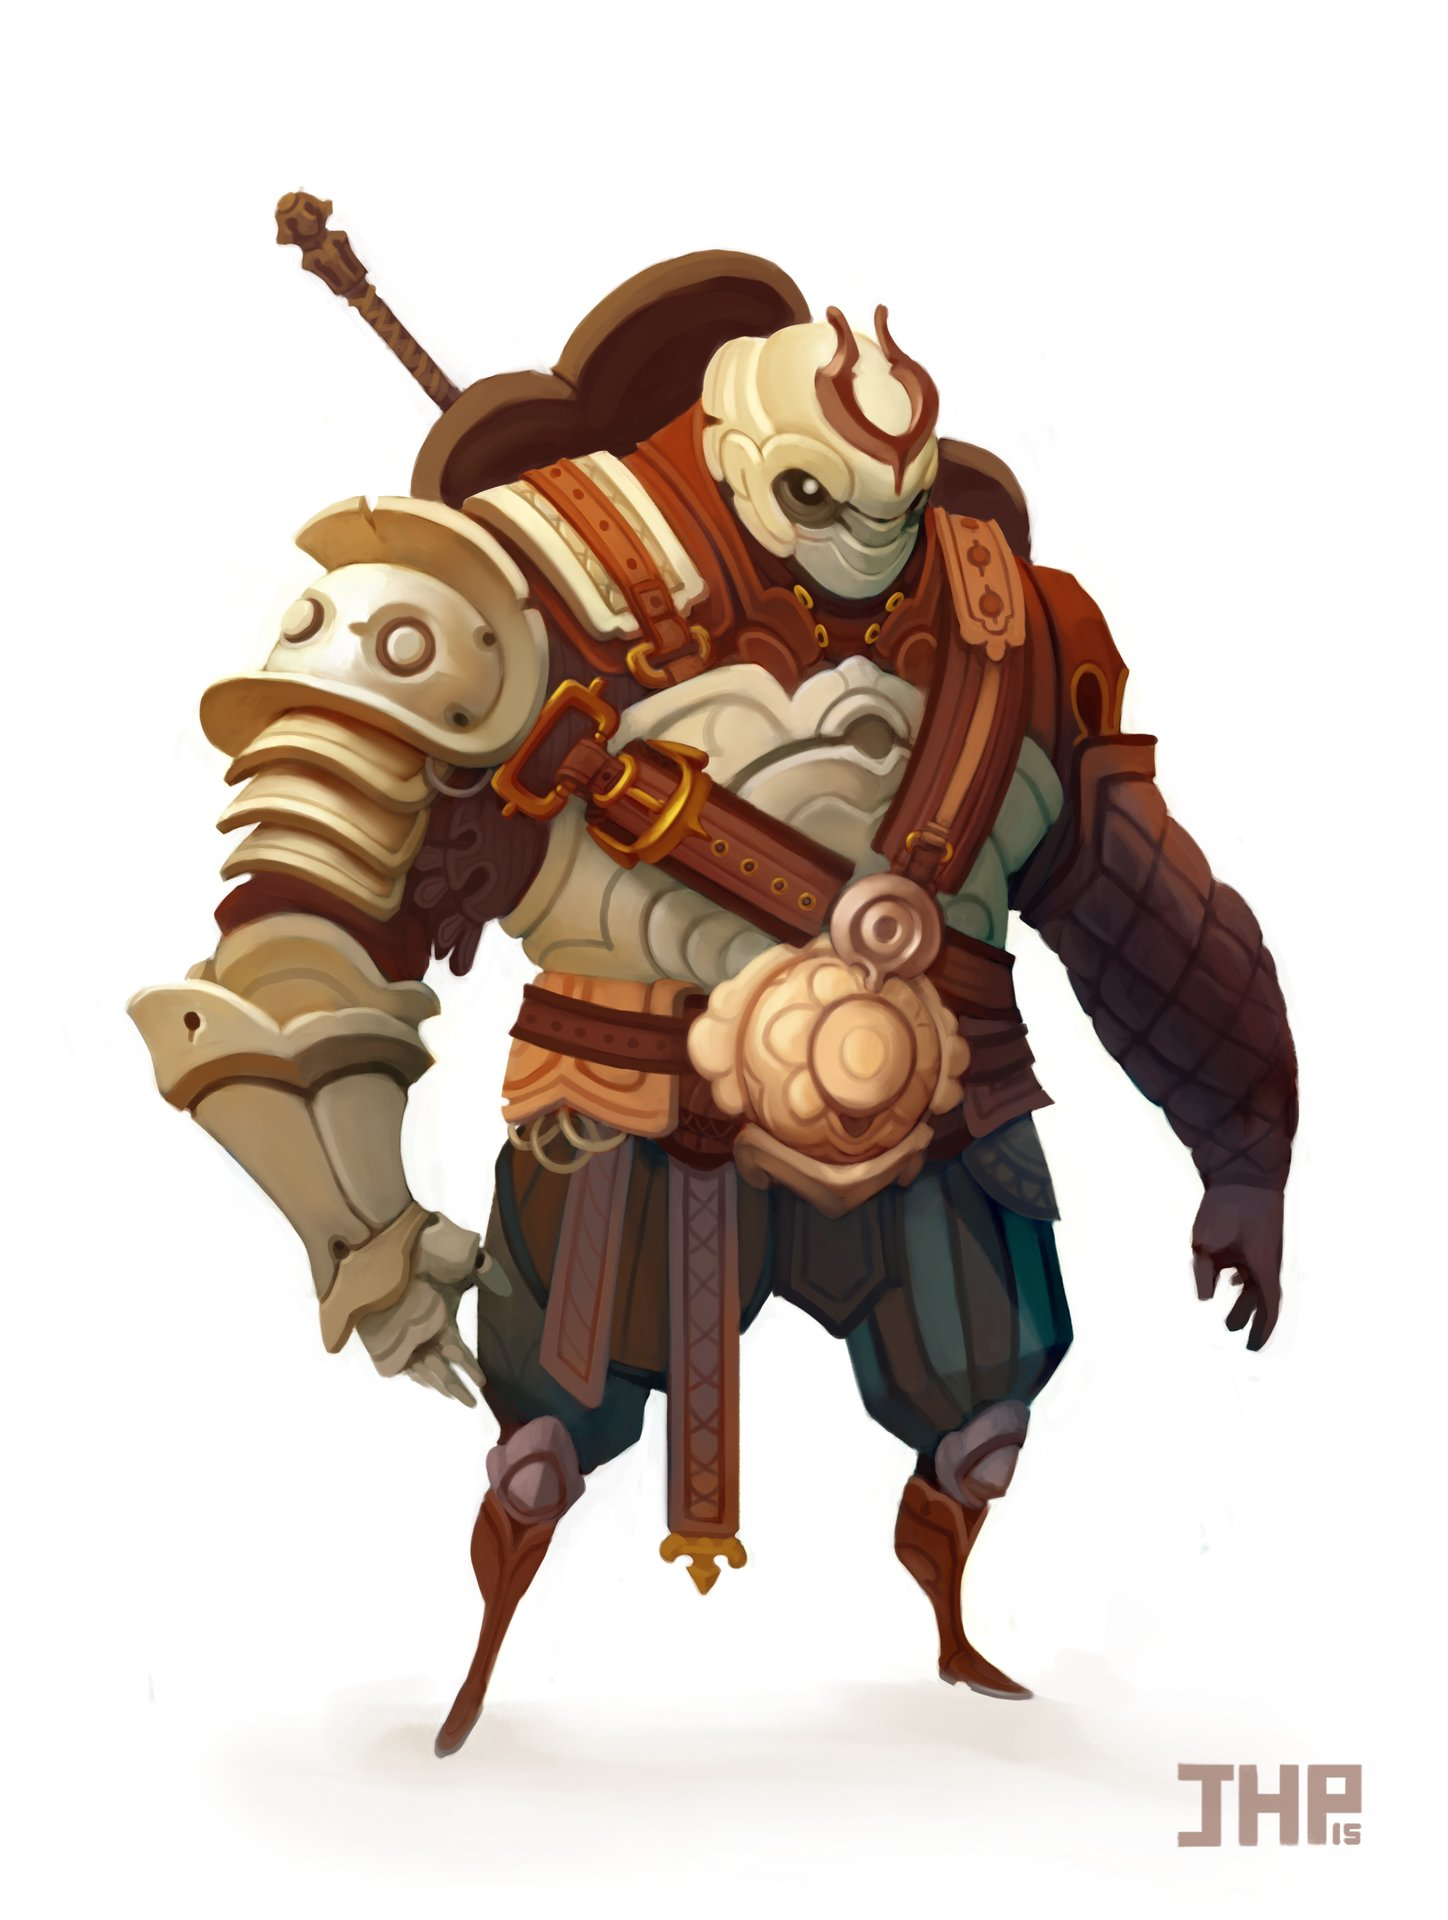 Joao henrique pacheco random warrior